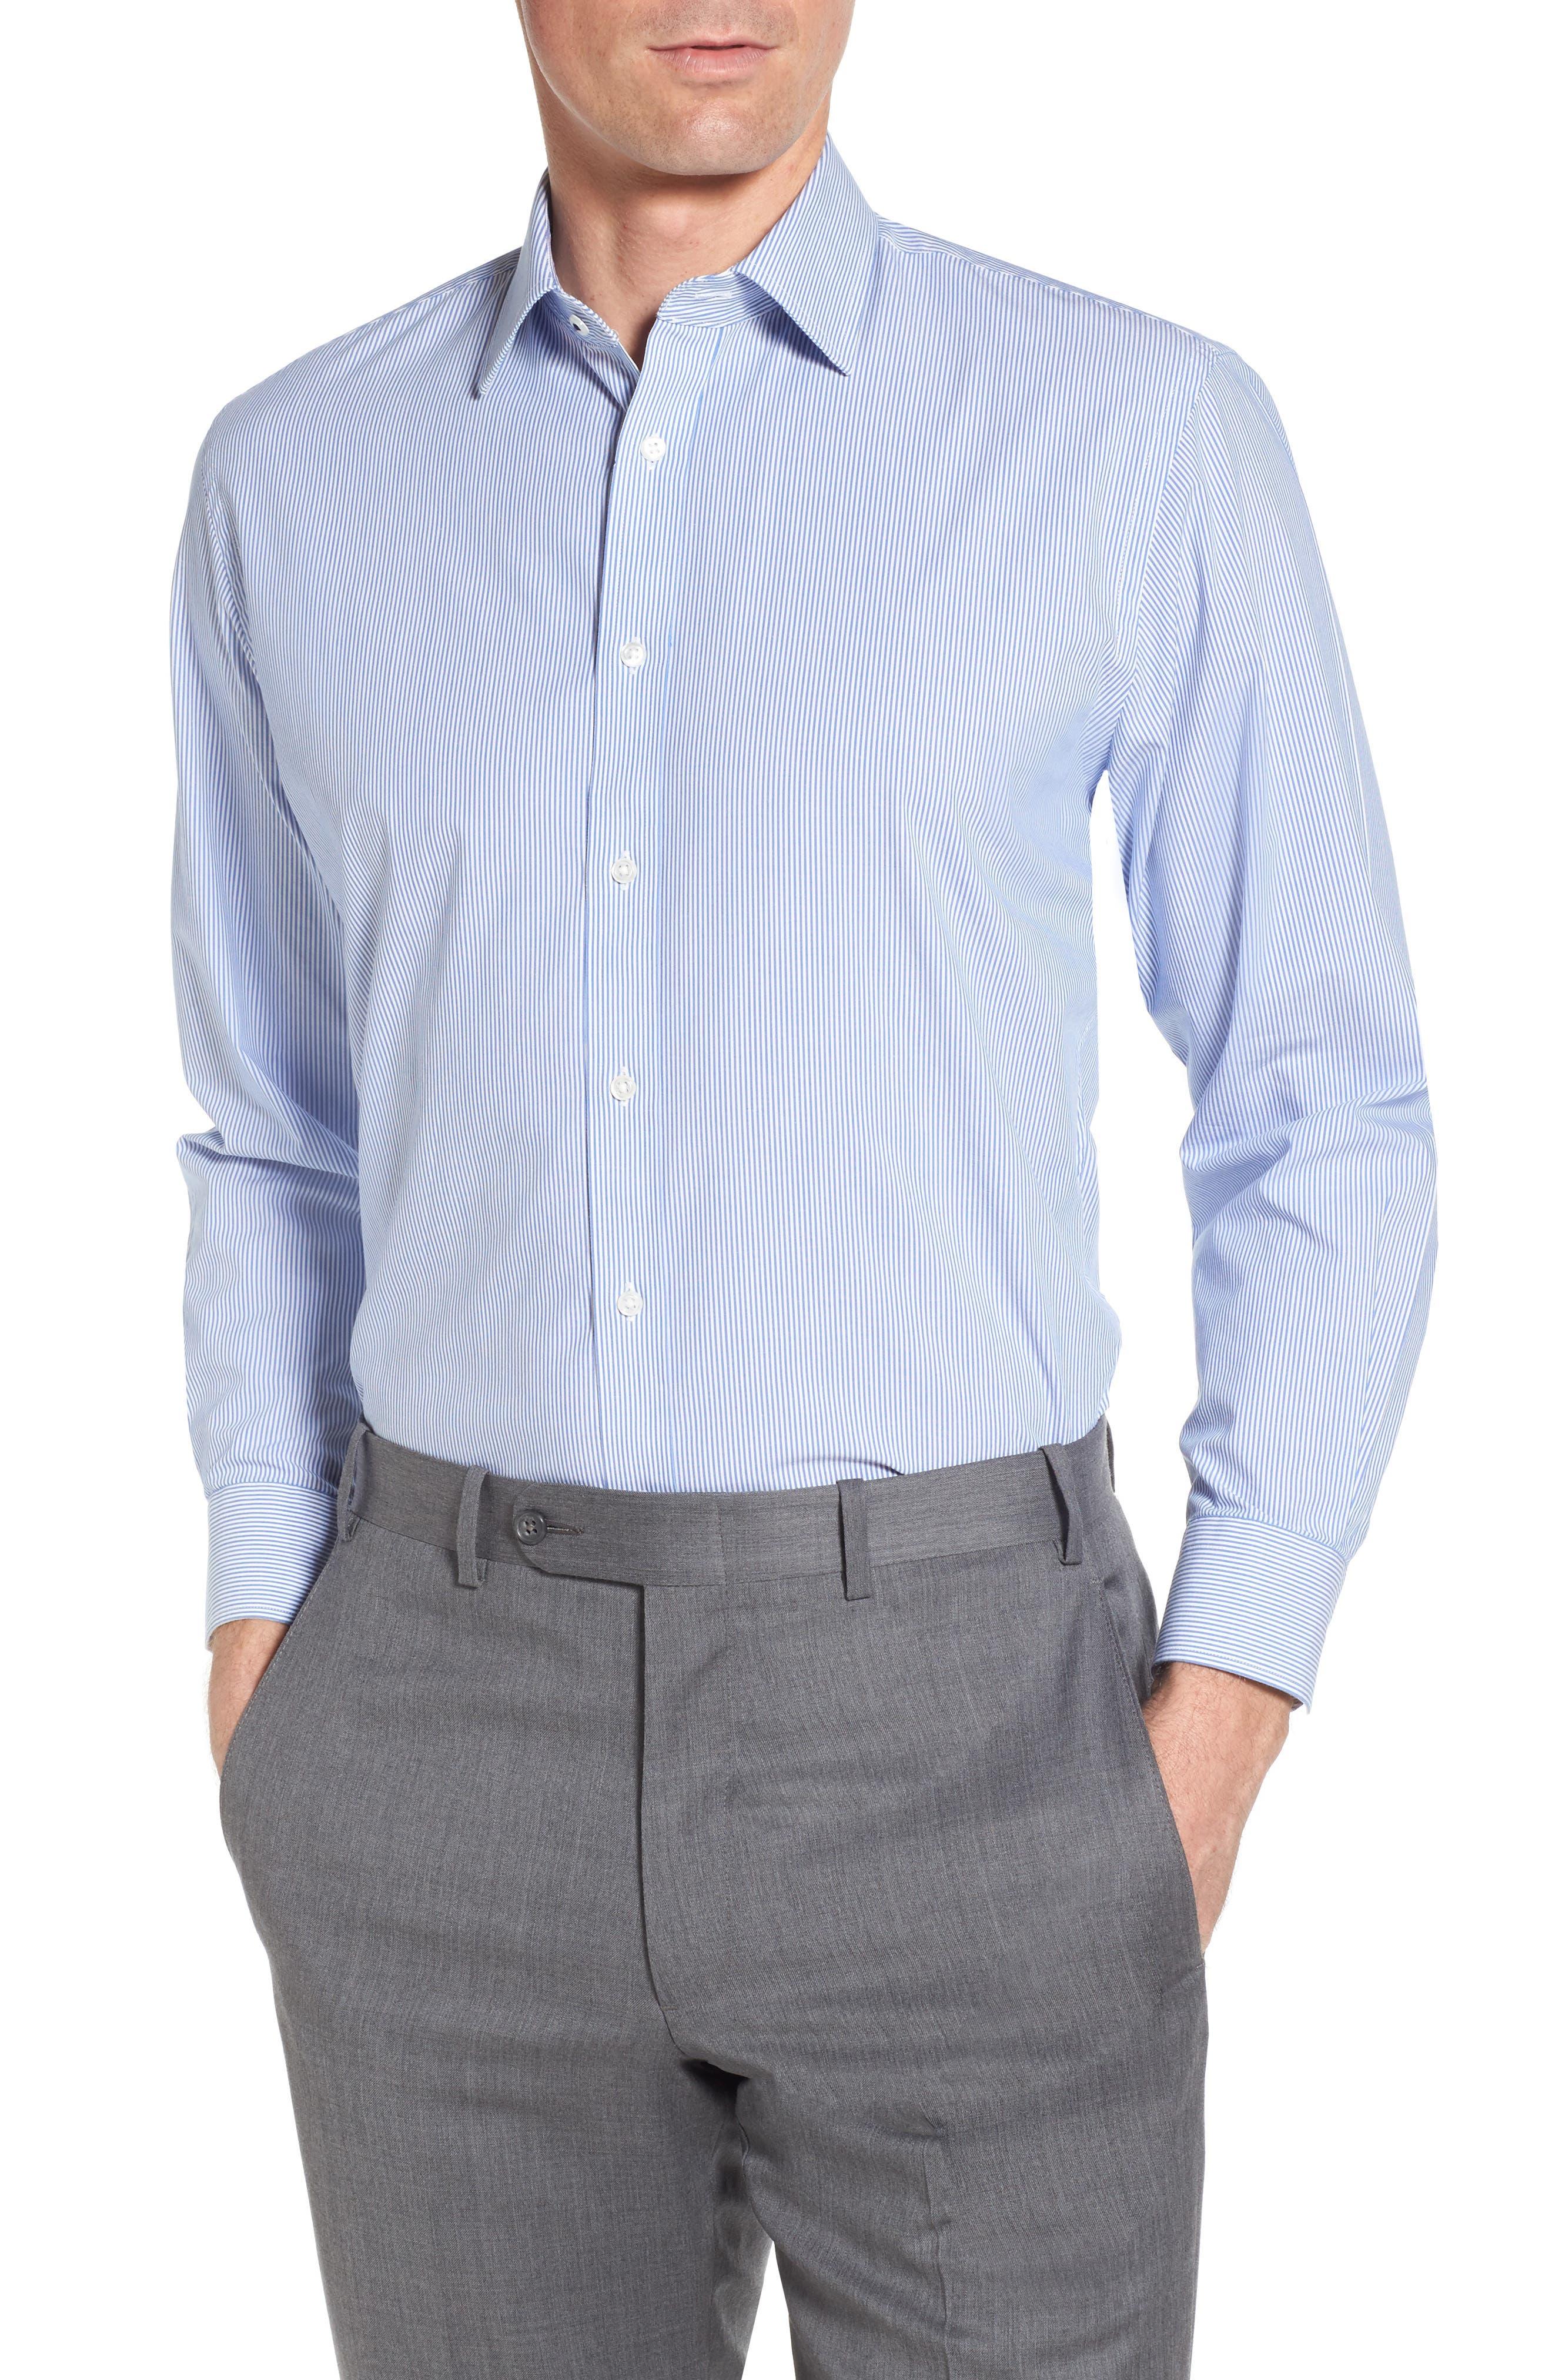 Main Image - Nordstrom Men's Shop Tech-Smart Traditional Fit Stripe Dress Shirt